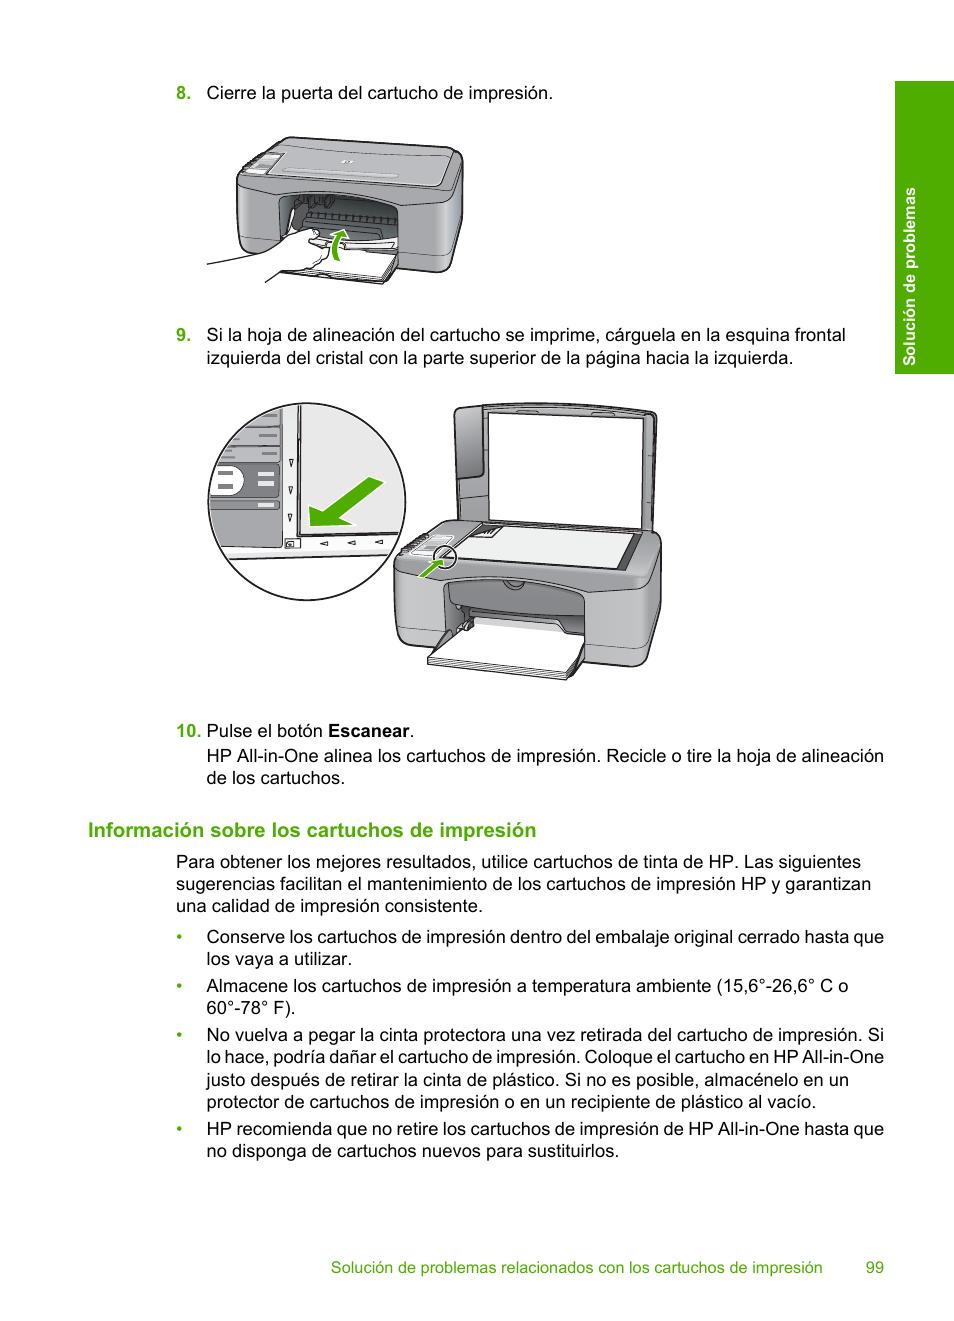 informaci n sobre los cartuchos de impresi n hp impresora todo en rh pdfmanuales com Impresora HP 3525 Impresoras HP LaserJet 2727